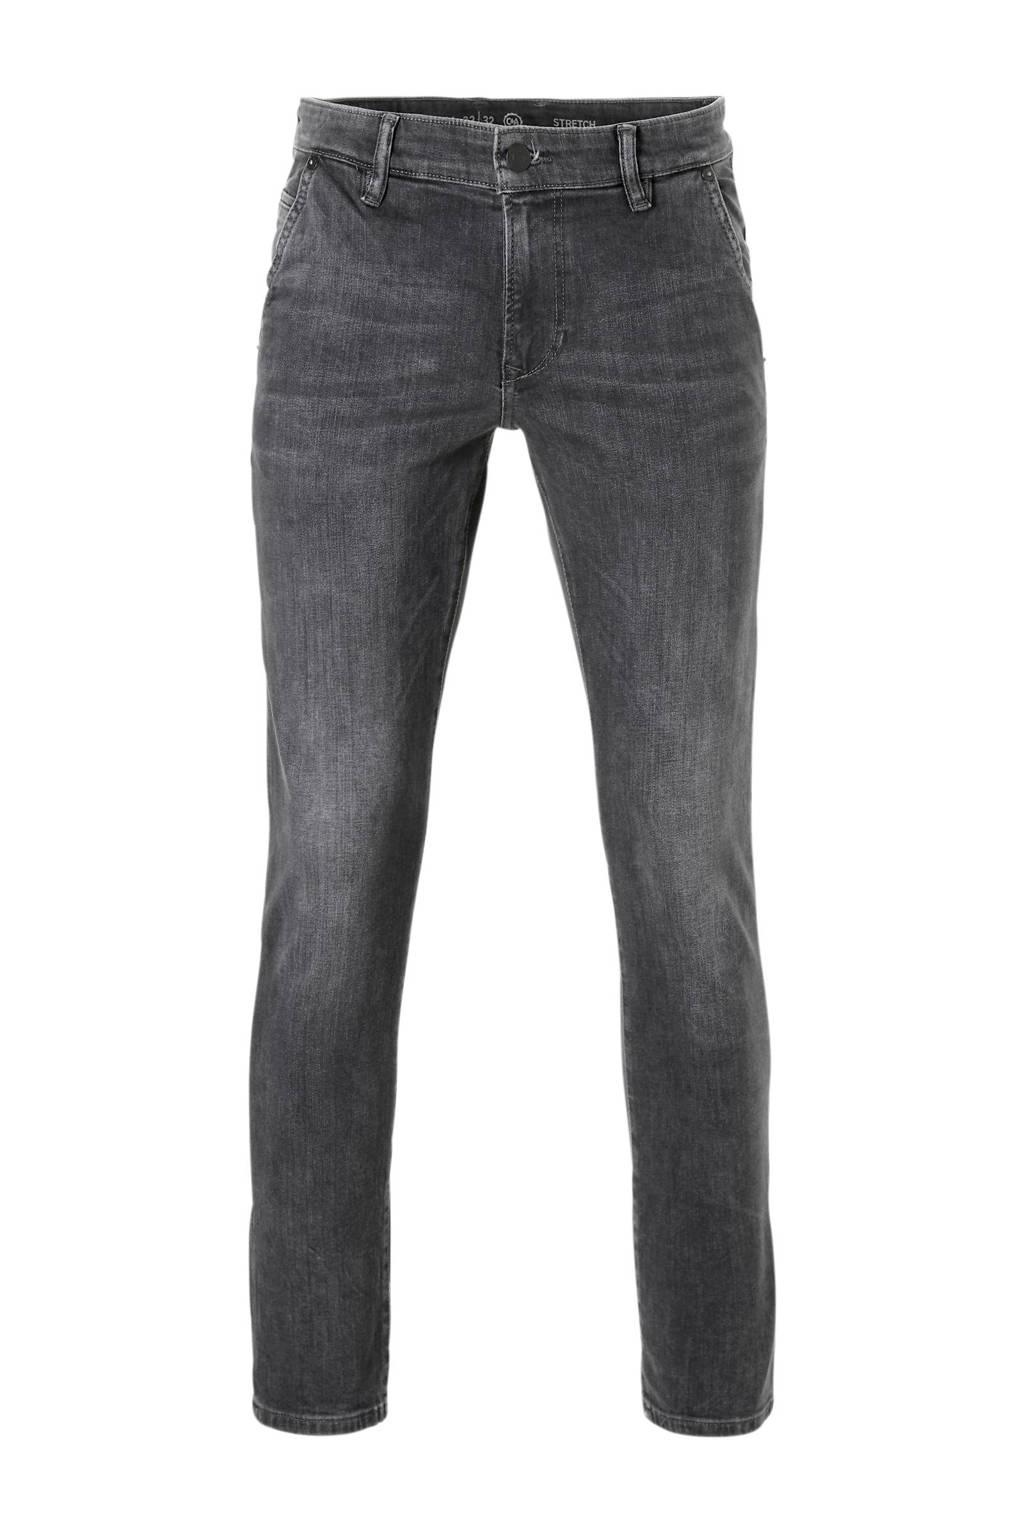 C&A The Denim slim fit chino jeans, Grijs